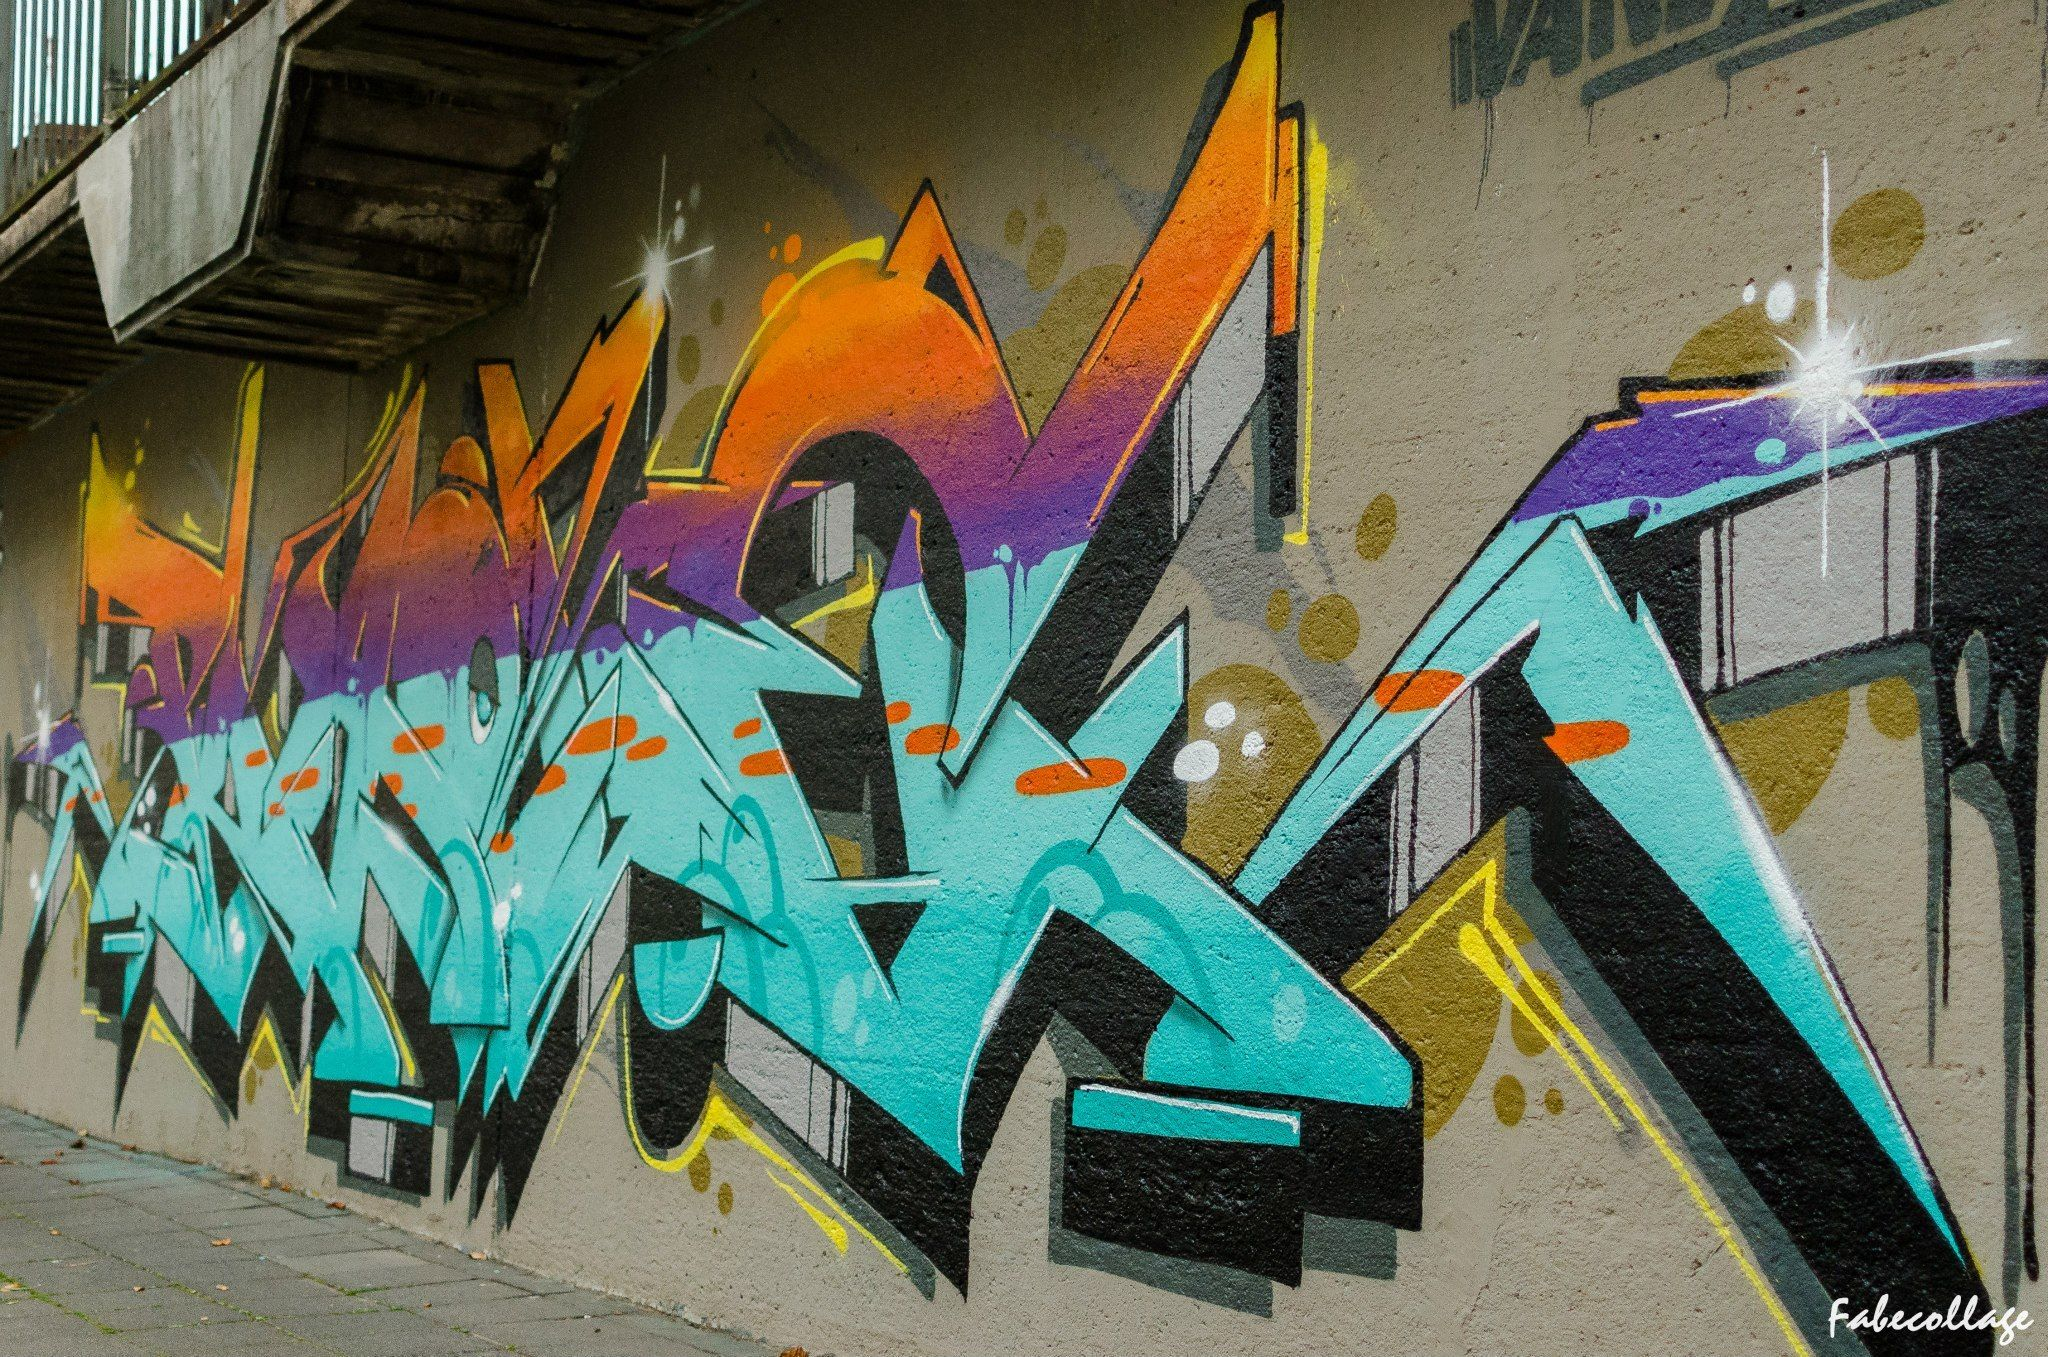 Pin by Noxx Hard on Street | Art, Street art, Graffiti art